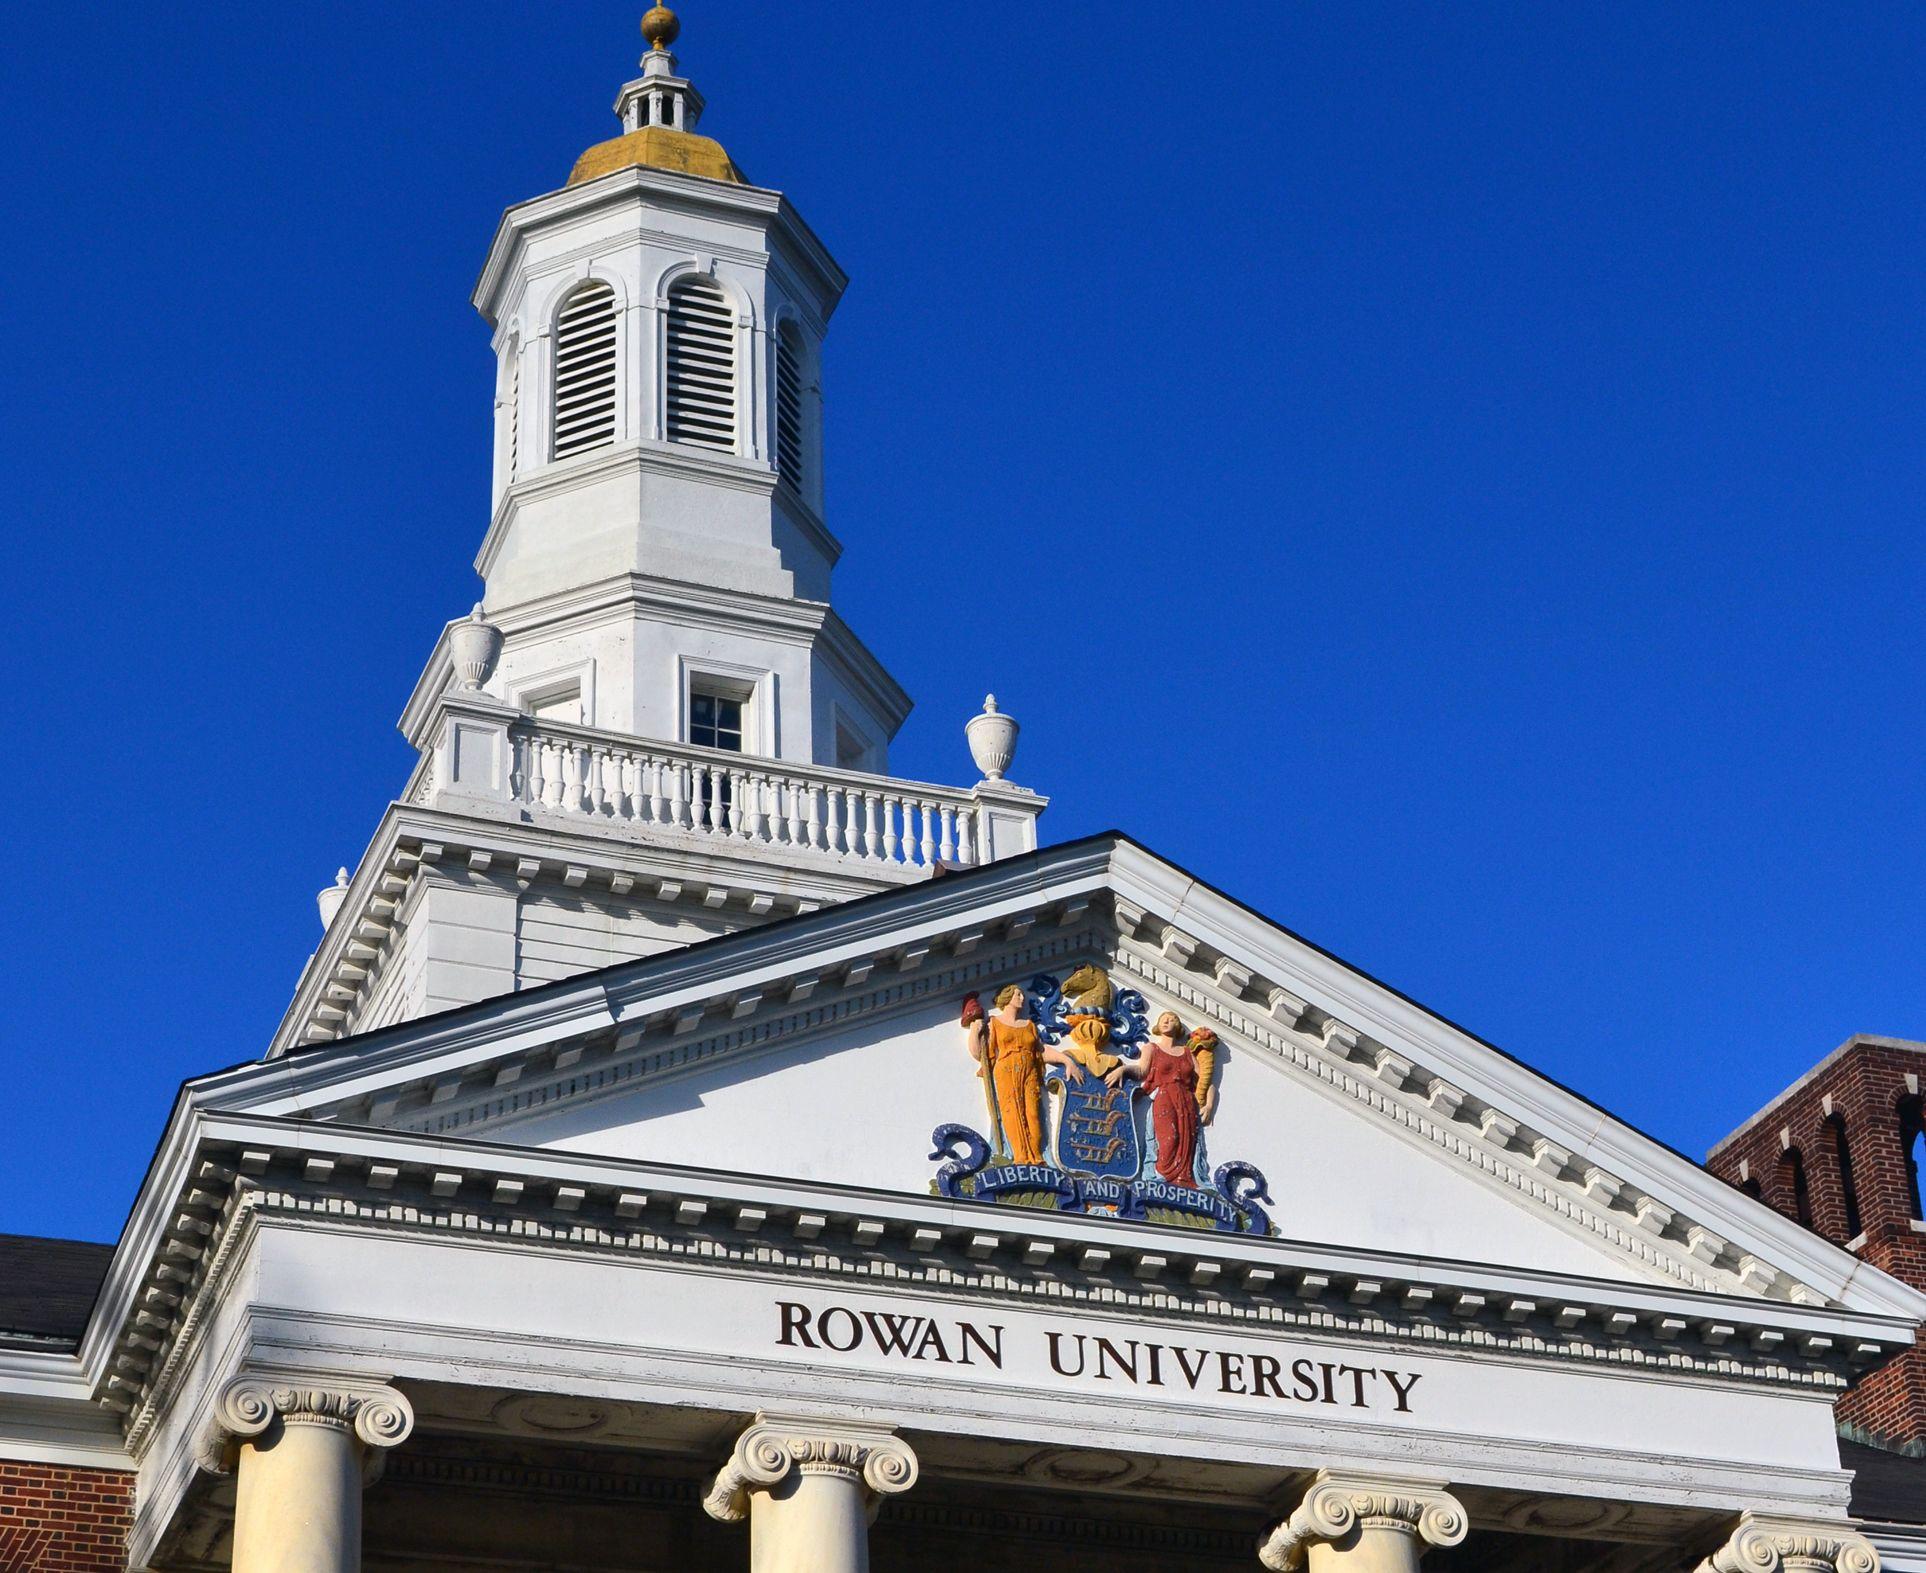 Rowan admissions essay